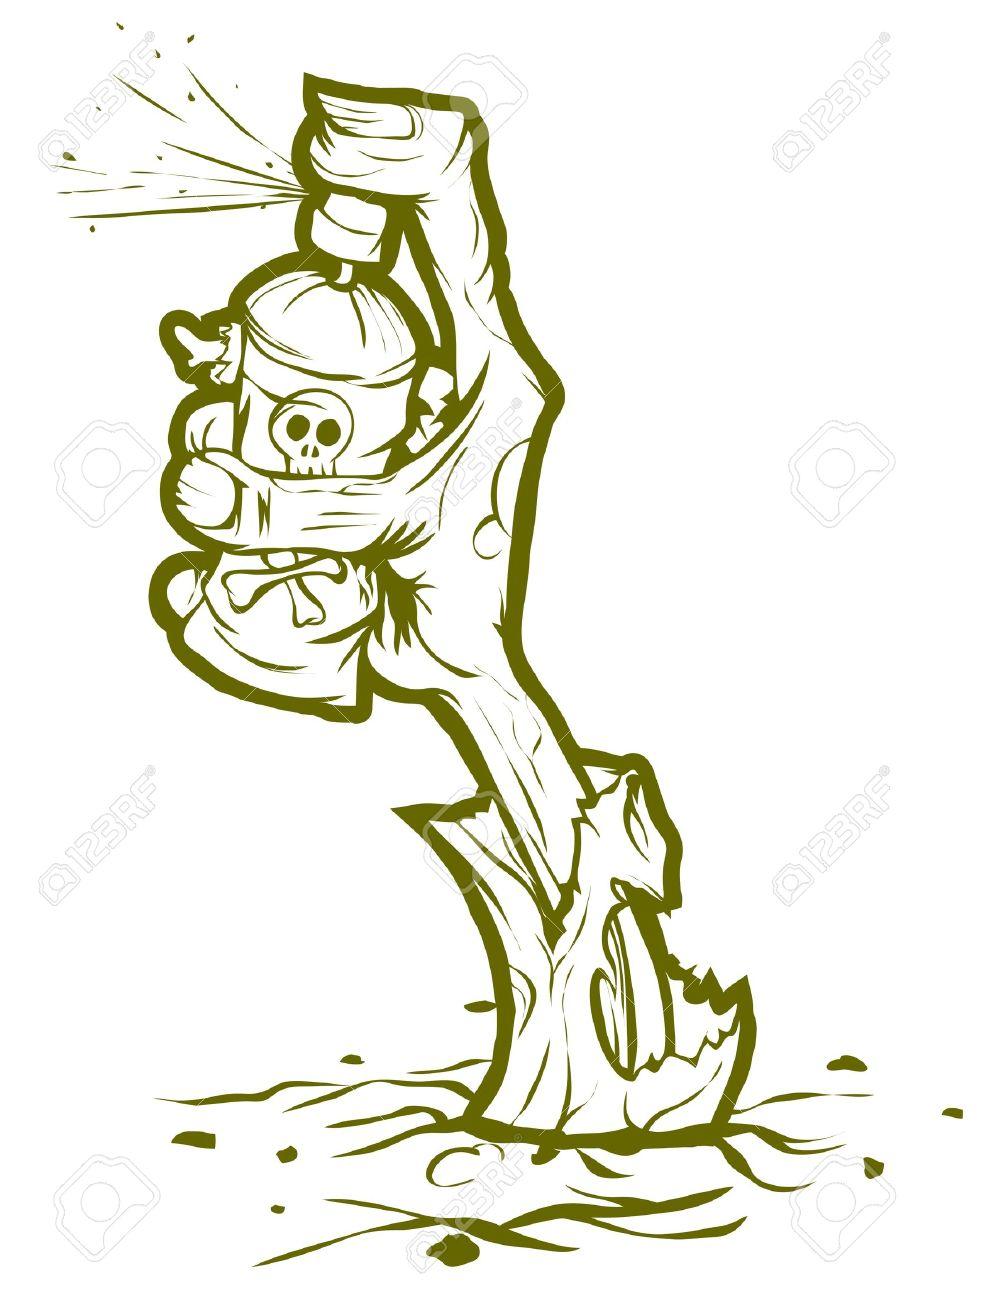 Cartoon Graffiti Spray Can